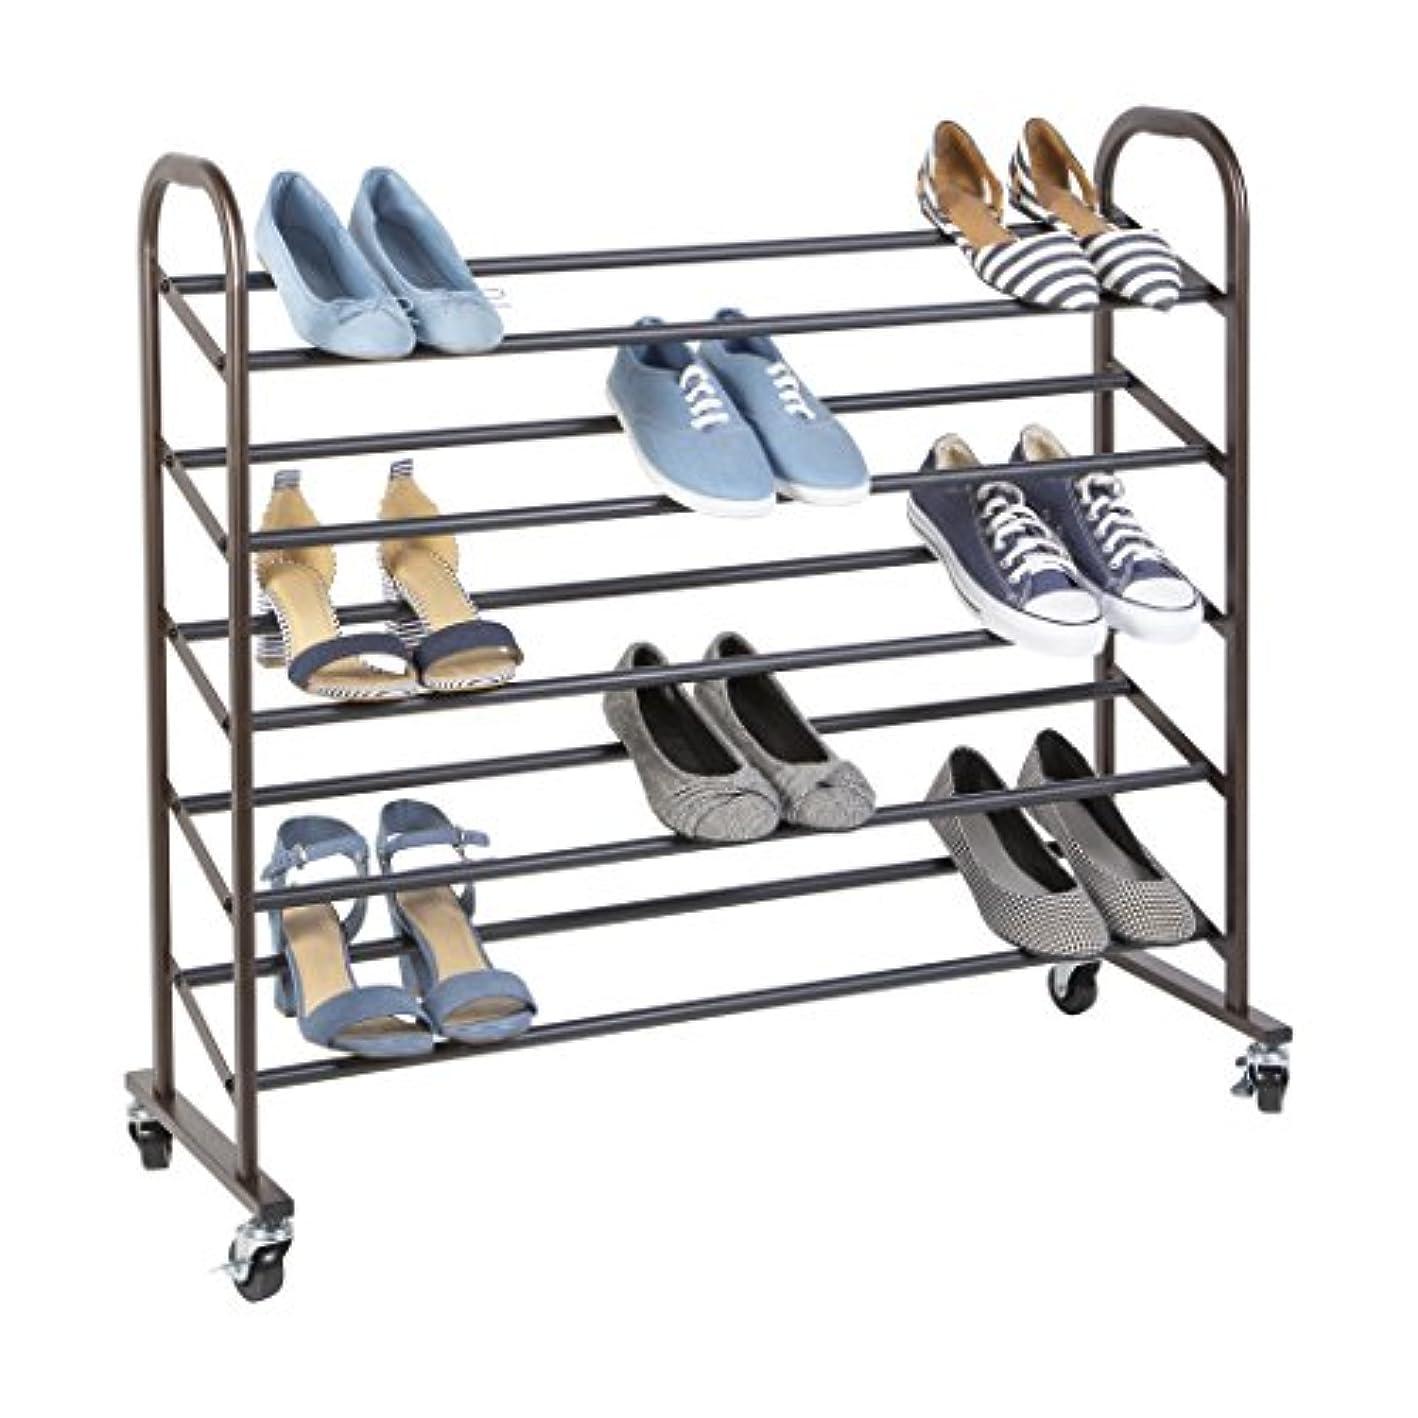 Richards Homewares 25 Pair Free Standing Shoe Rack with Wheels, Bronze